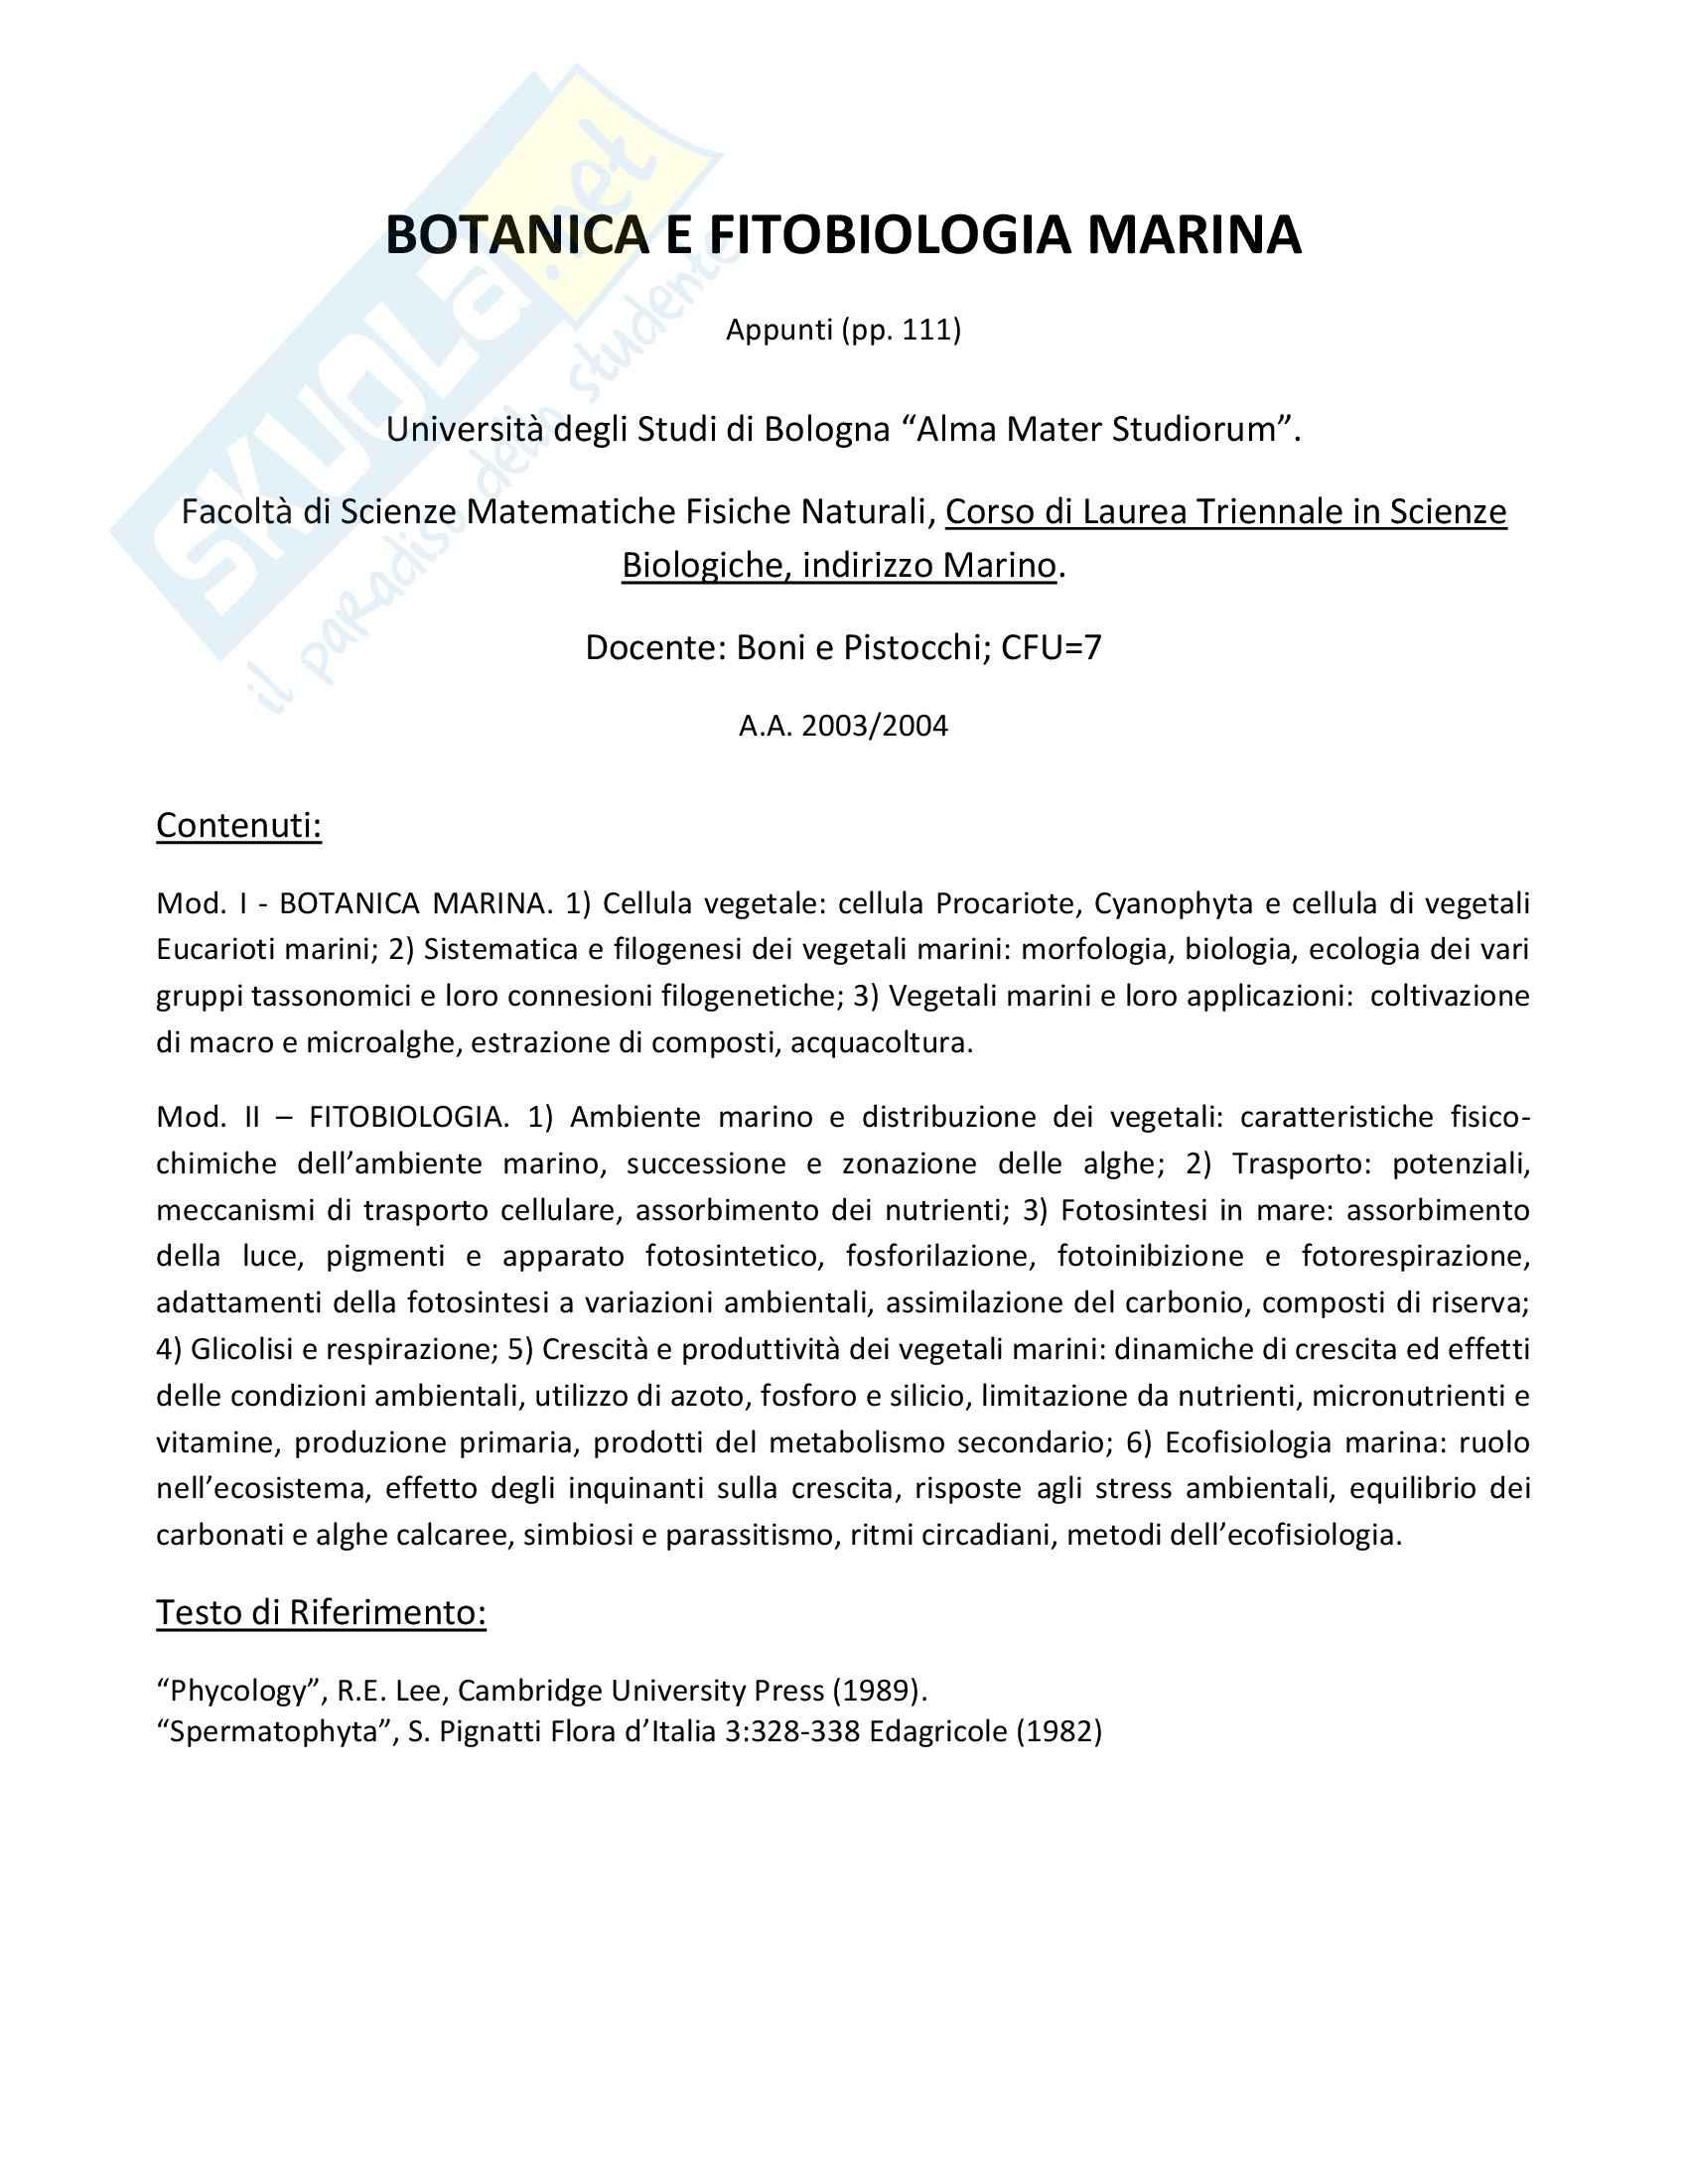 Botanica e Fitobiologia Marina - Appunti